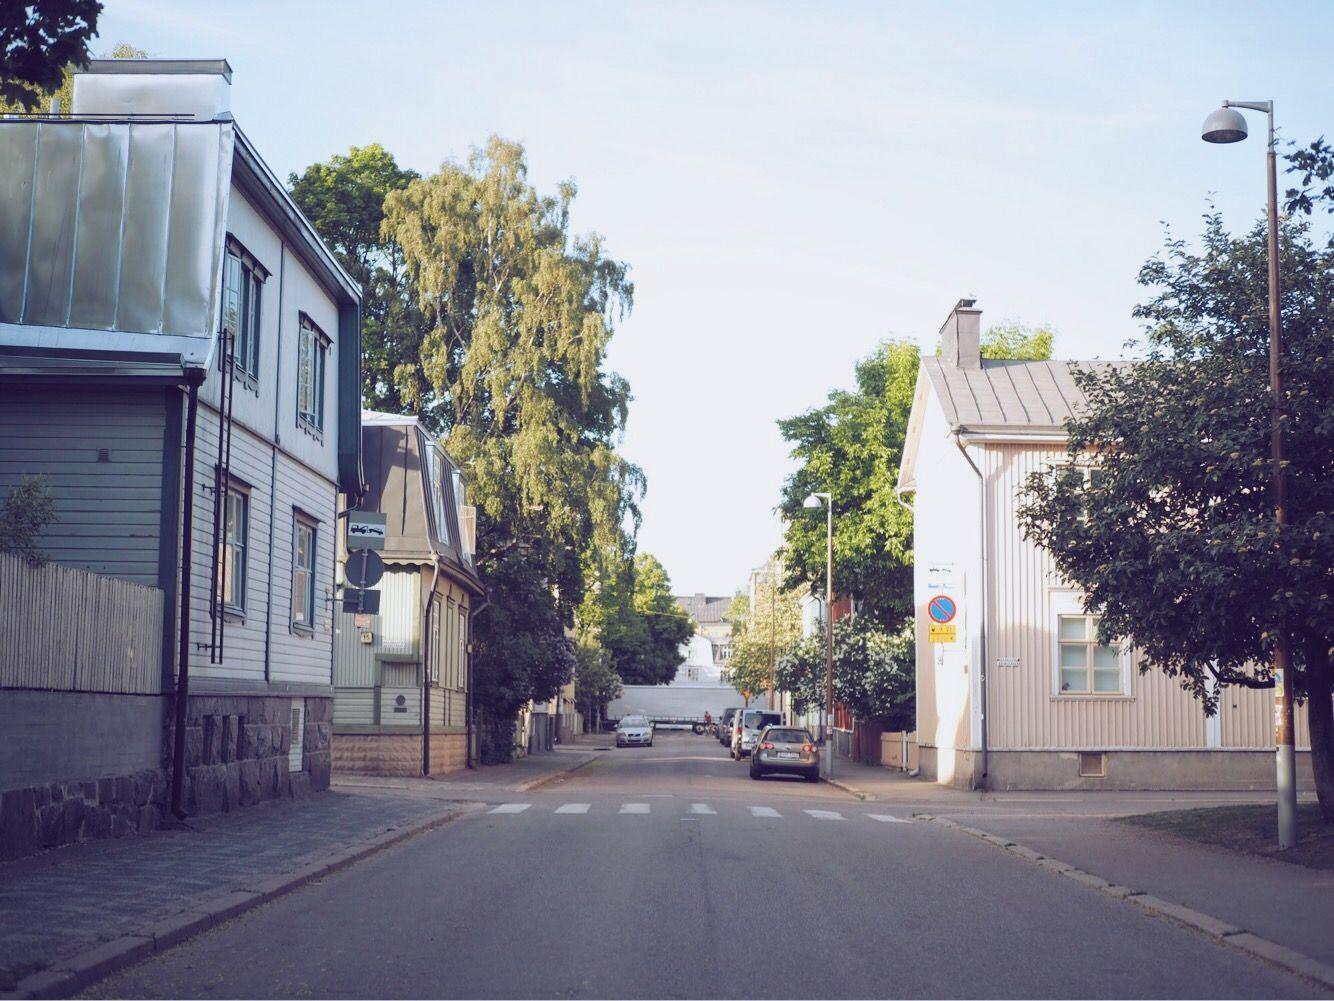 Puu-Vallila